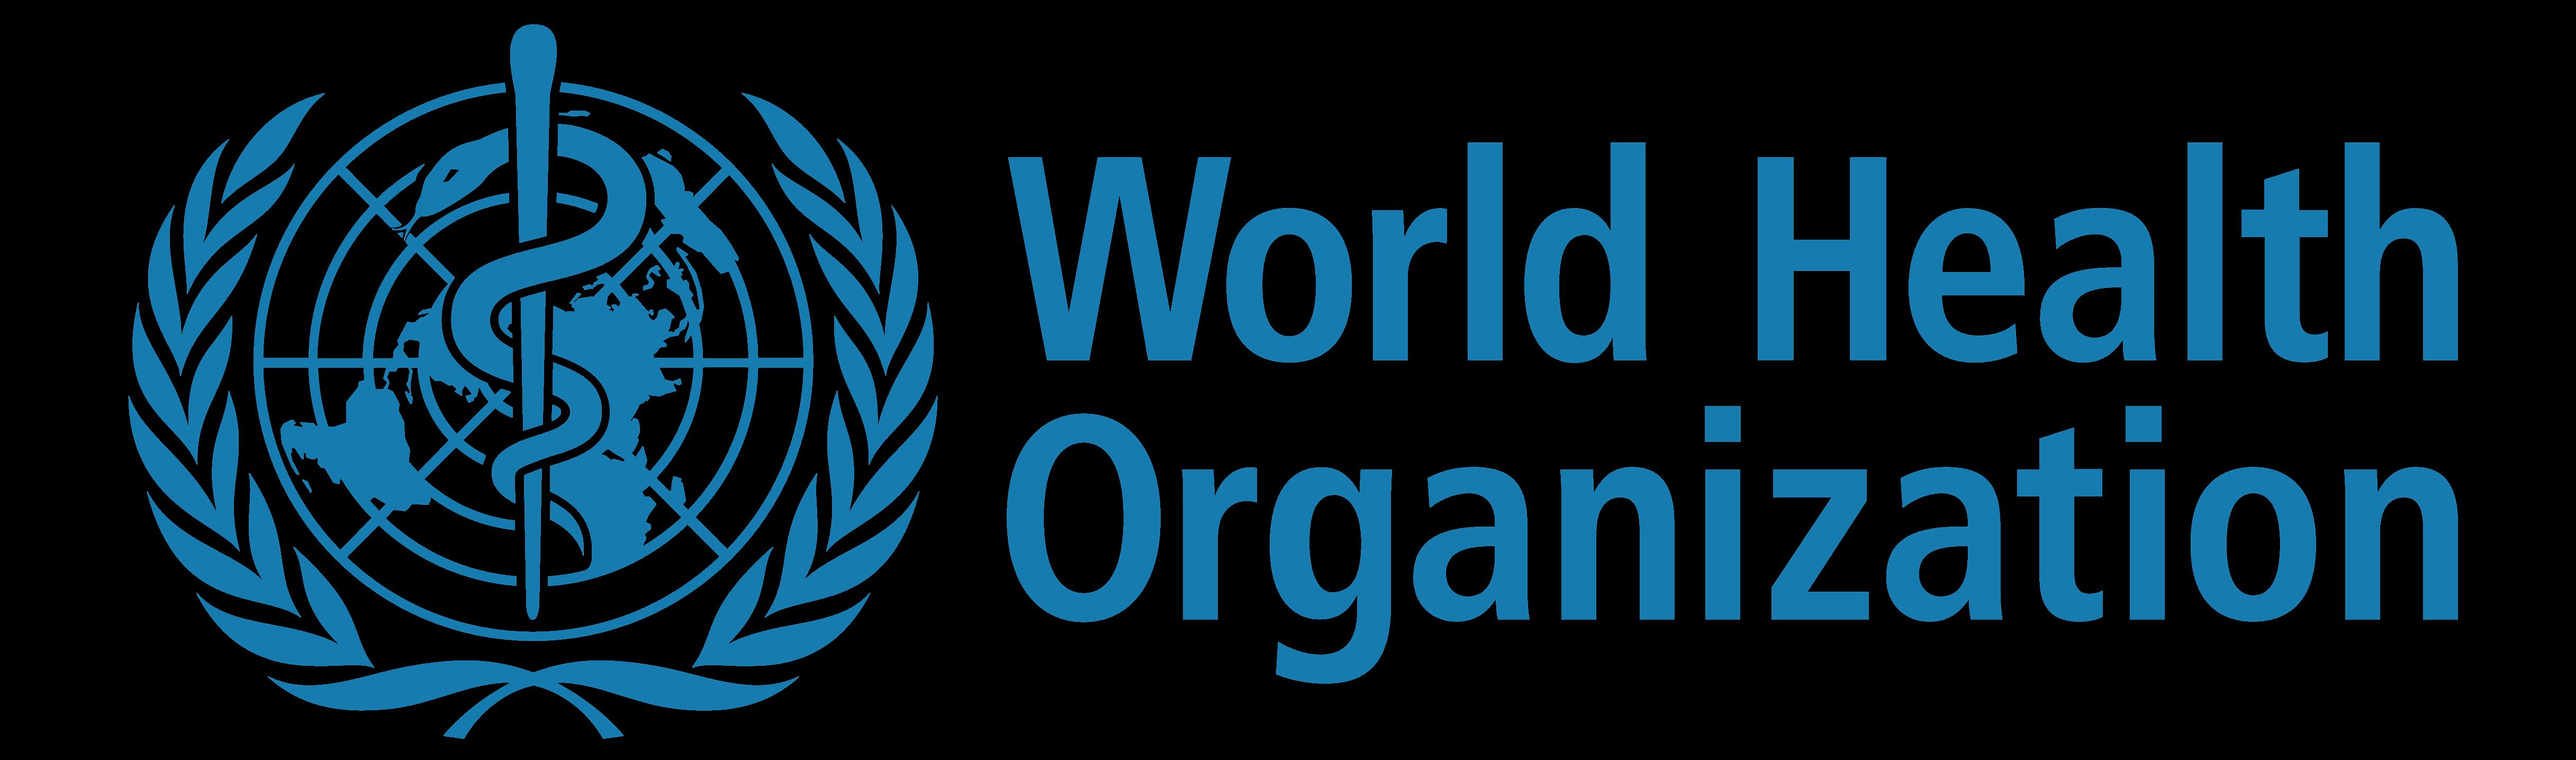 World Health Organization logo logotype